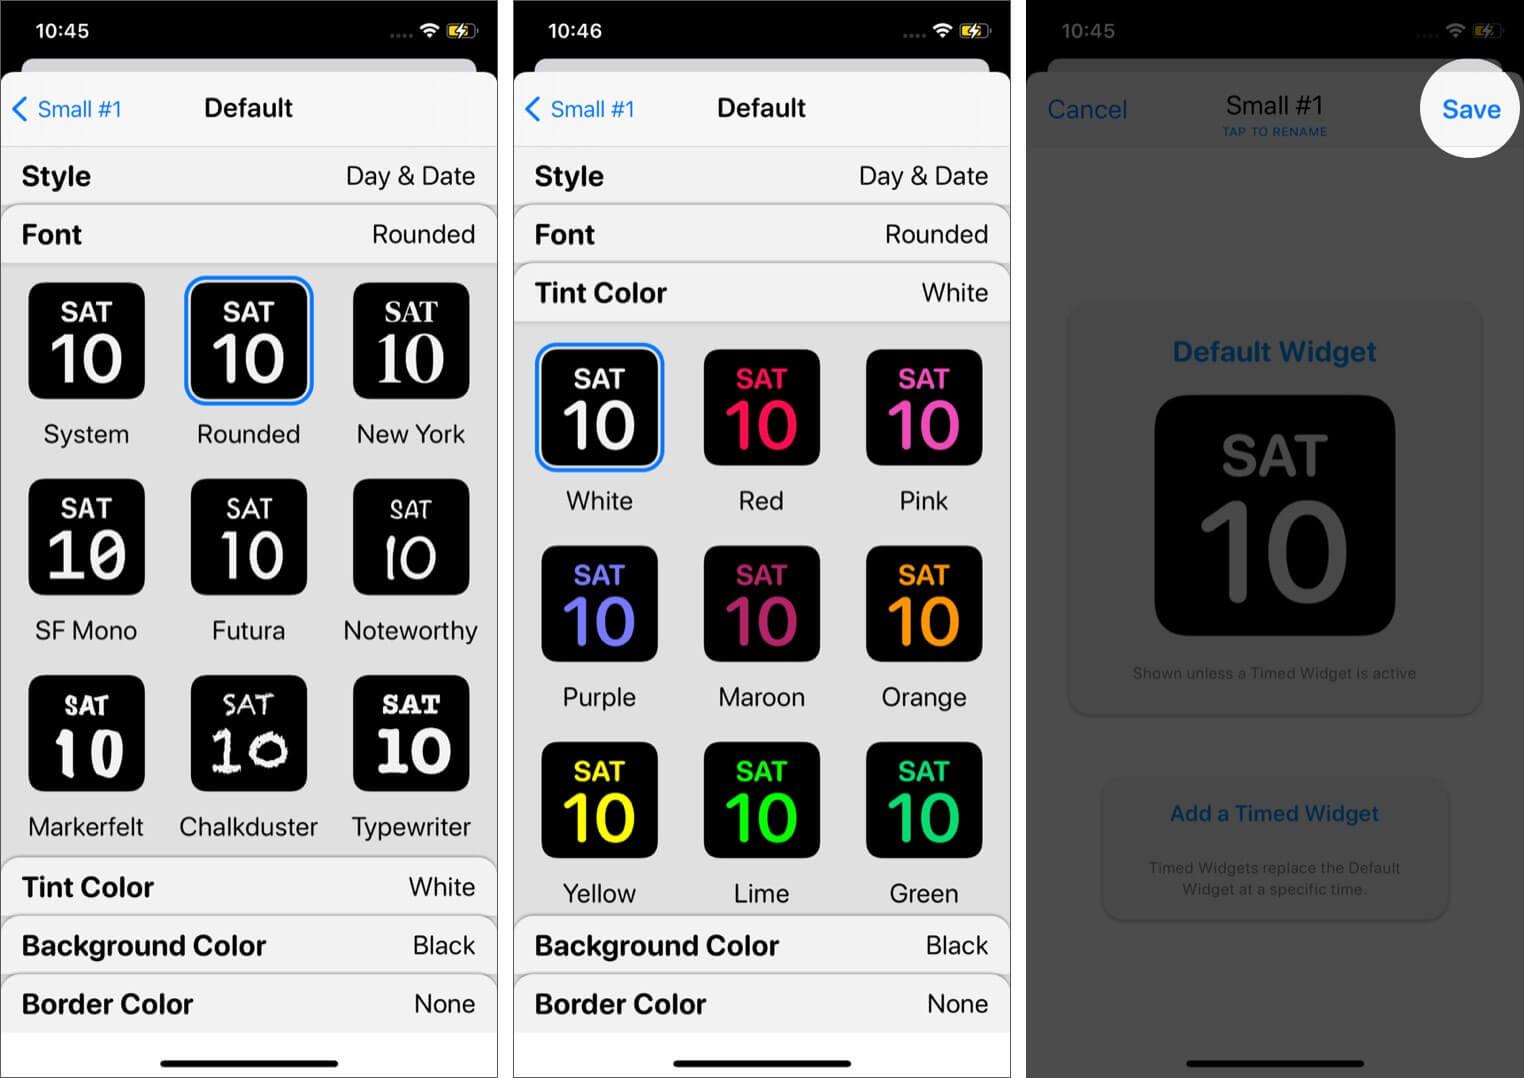 Create Widget in WidgetSmith App on iPhone Running iOS 14